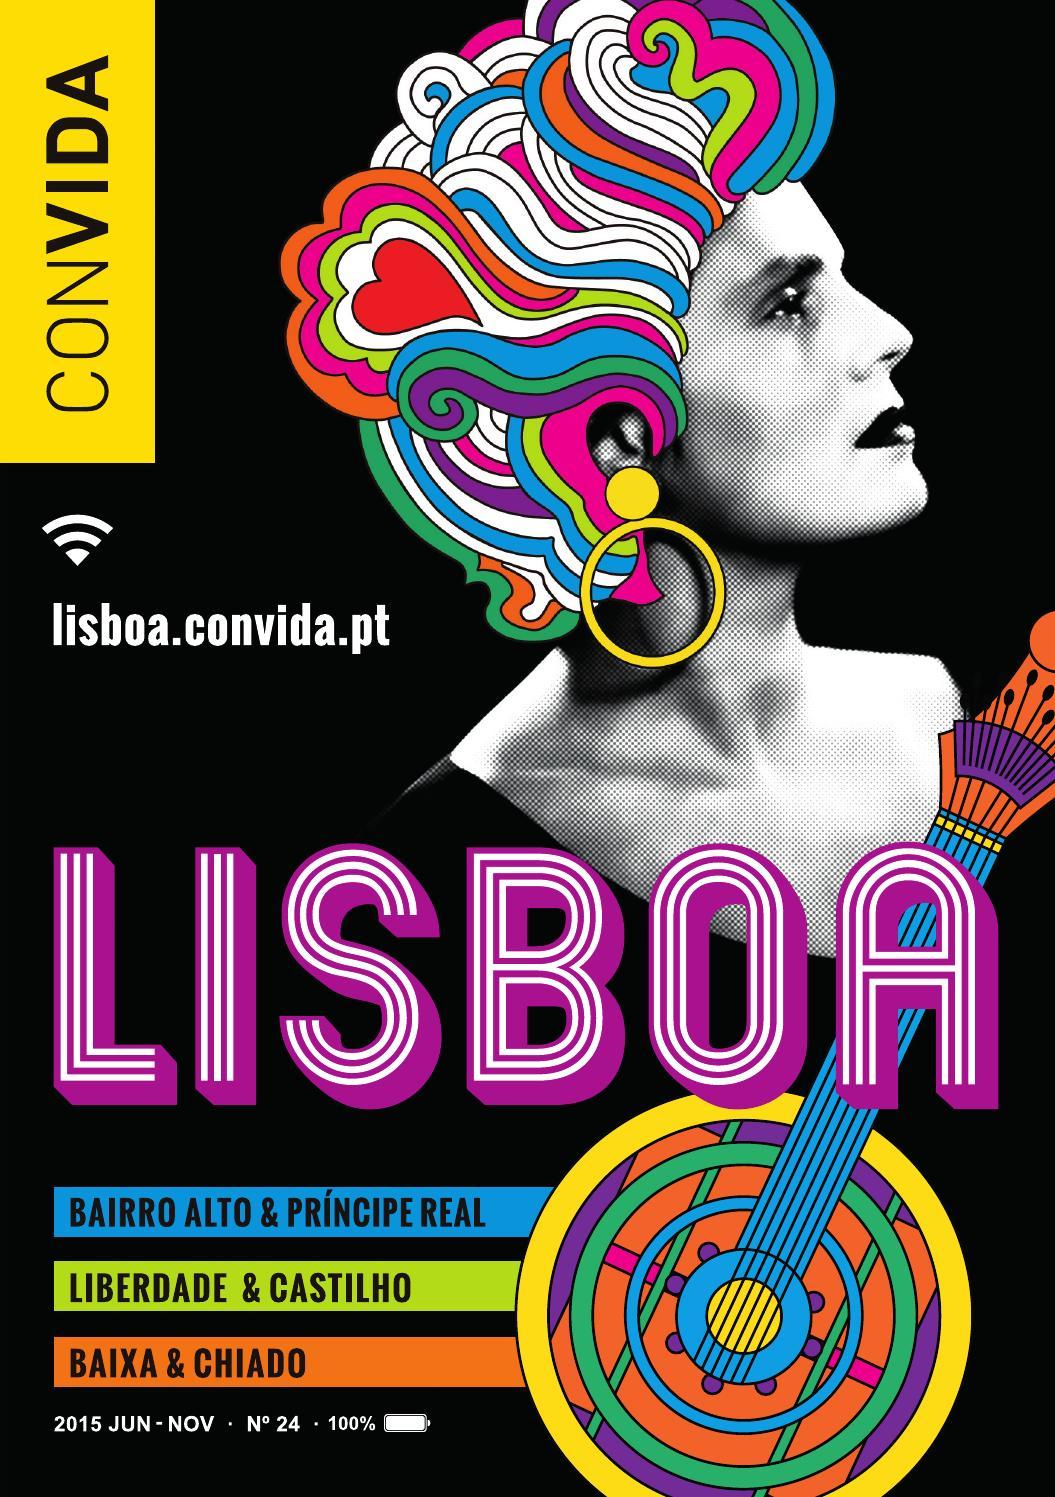 Lisboa ConVida   2015 jun - nov by ConVida - issuu 03bec41743